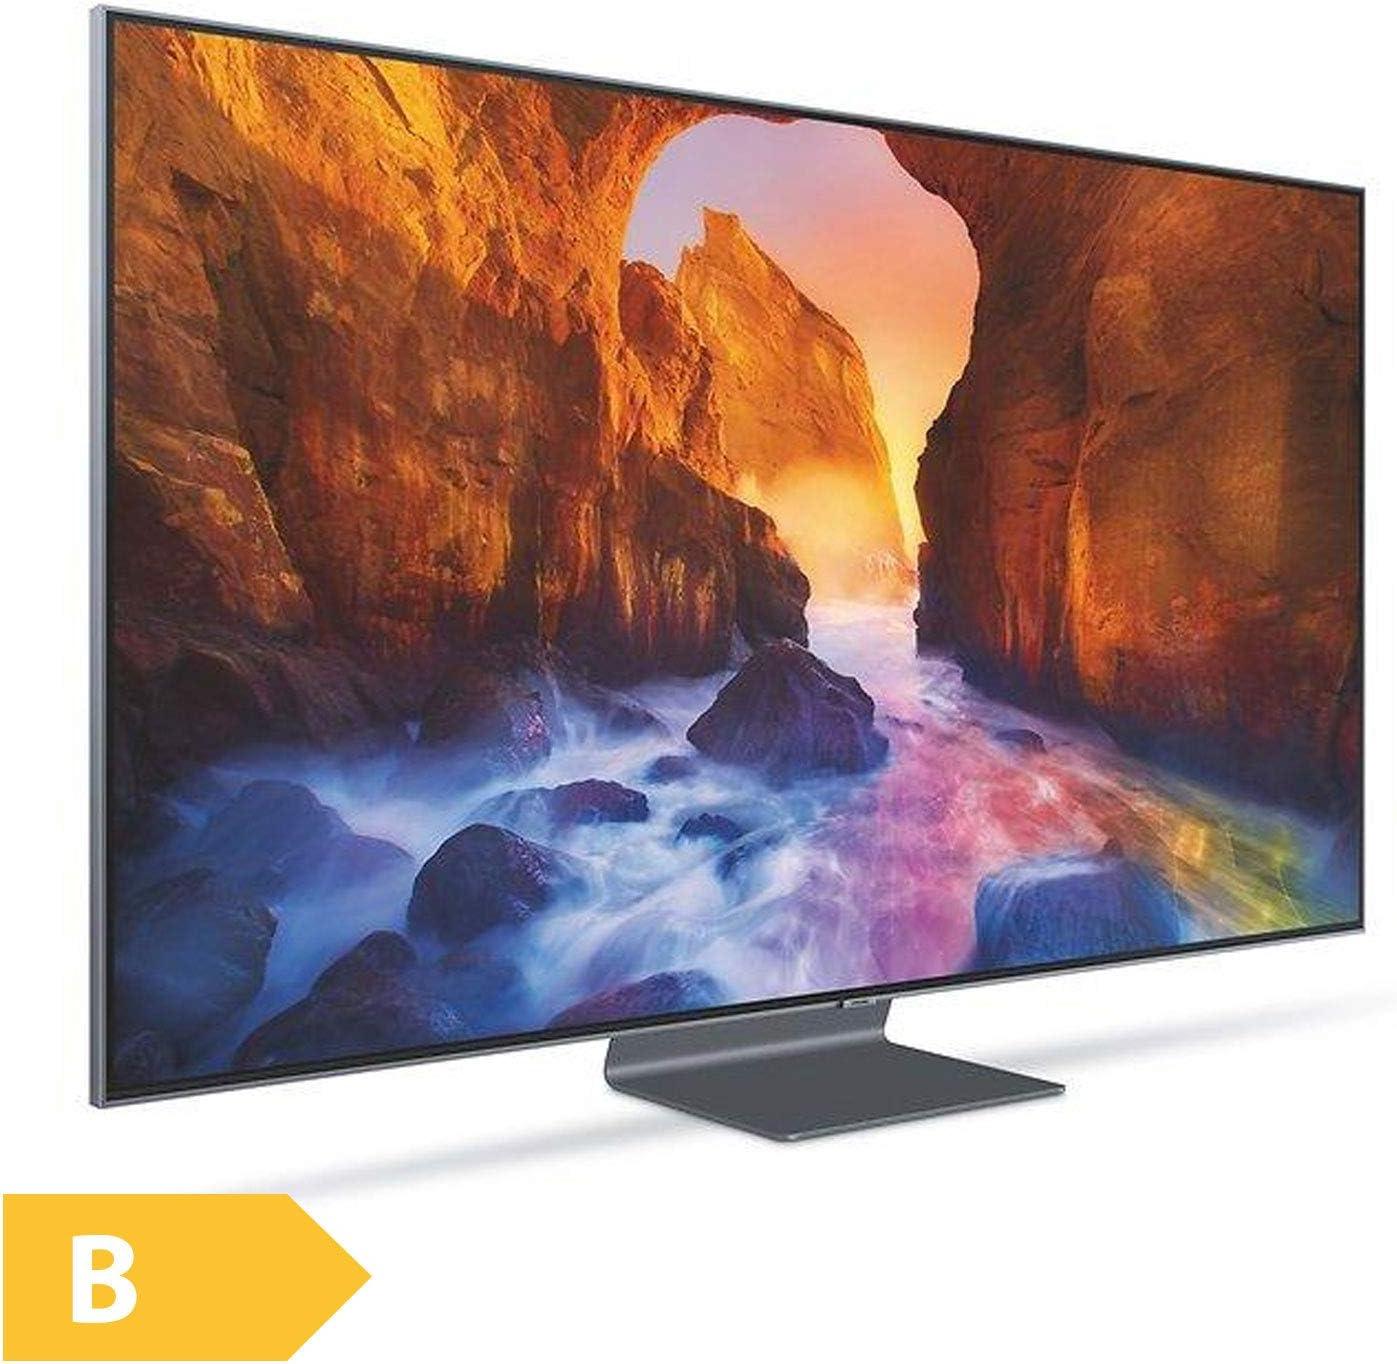 Samsung GQ75Q90RGTXZG 189 cm (75 pulgadas) Plano QLED TV Q90R (2019): Amazon.es: Electrónica